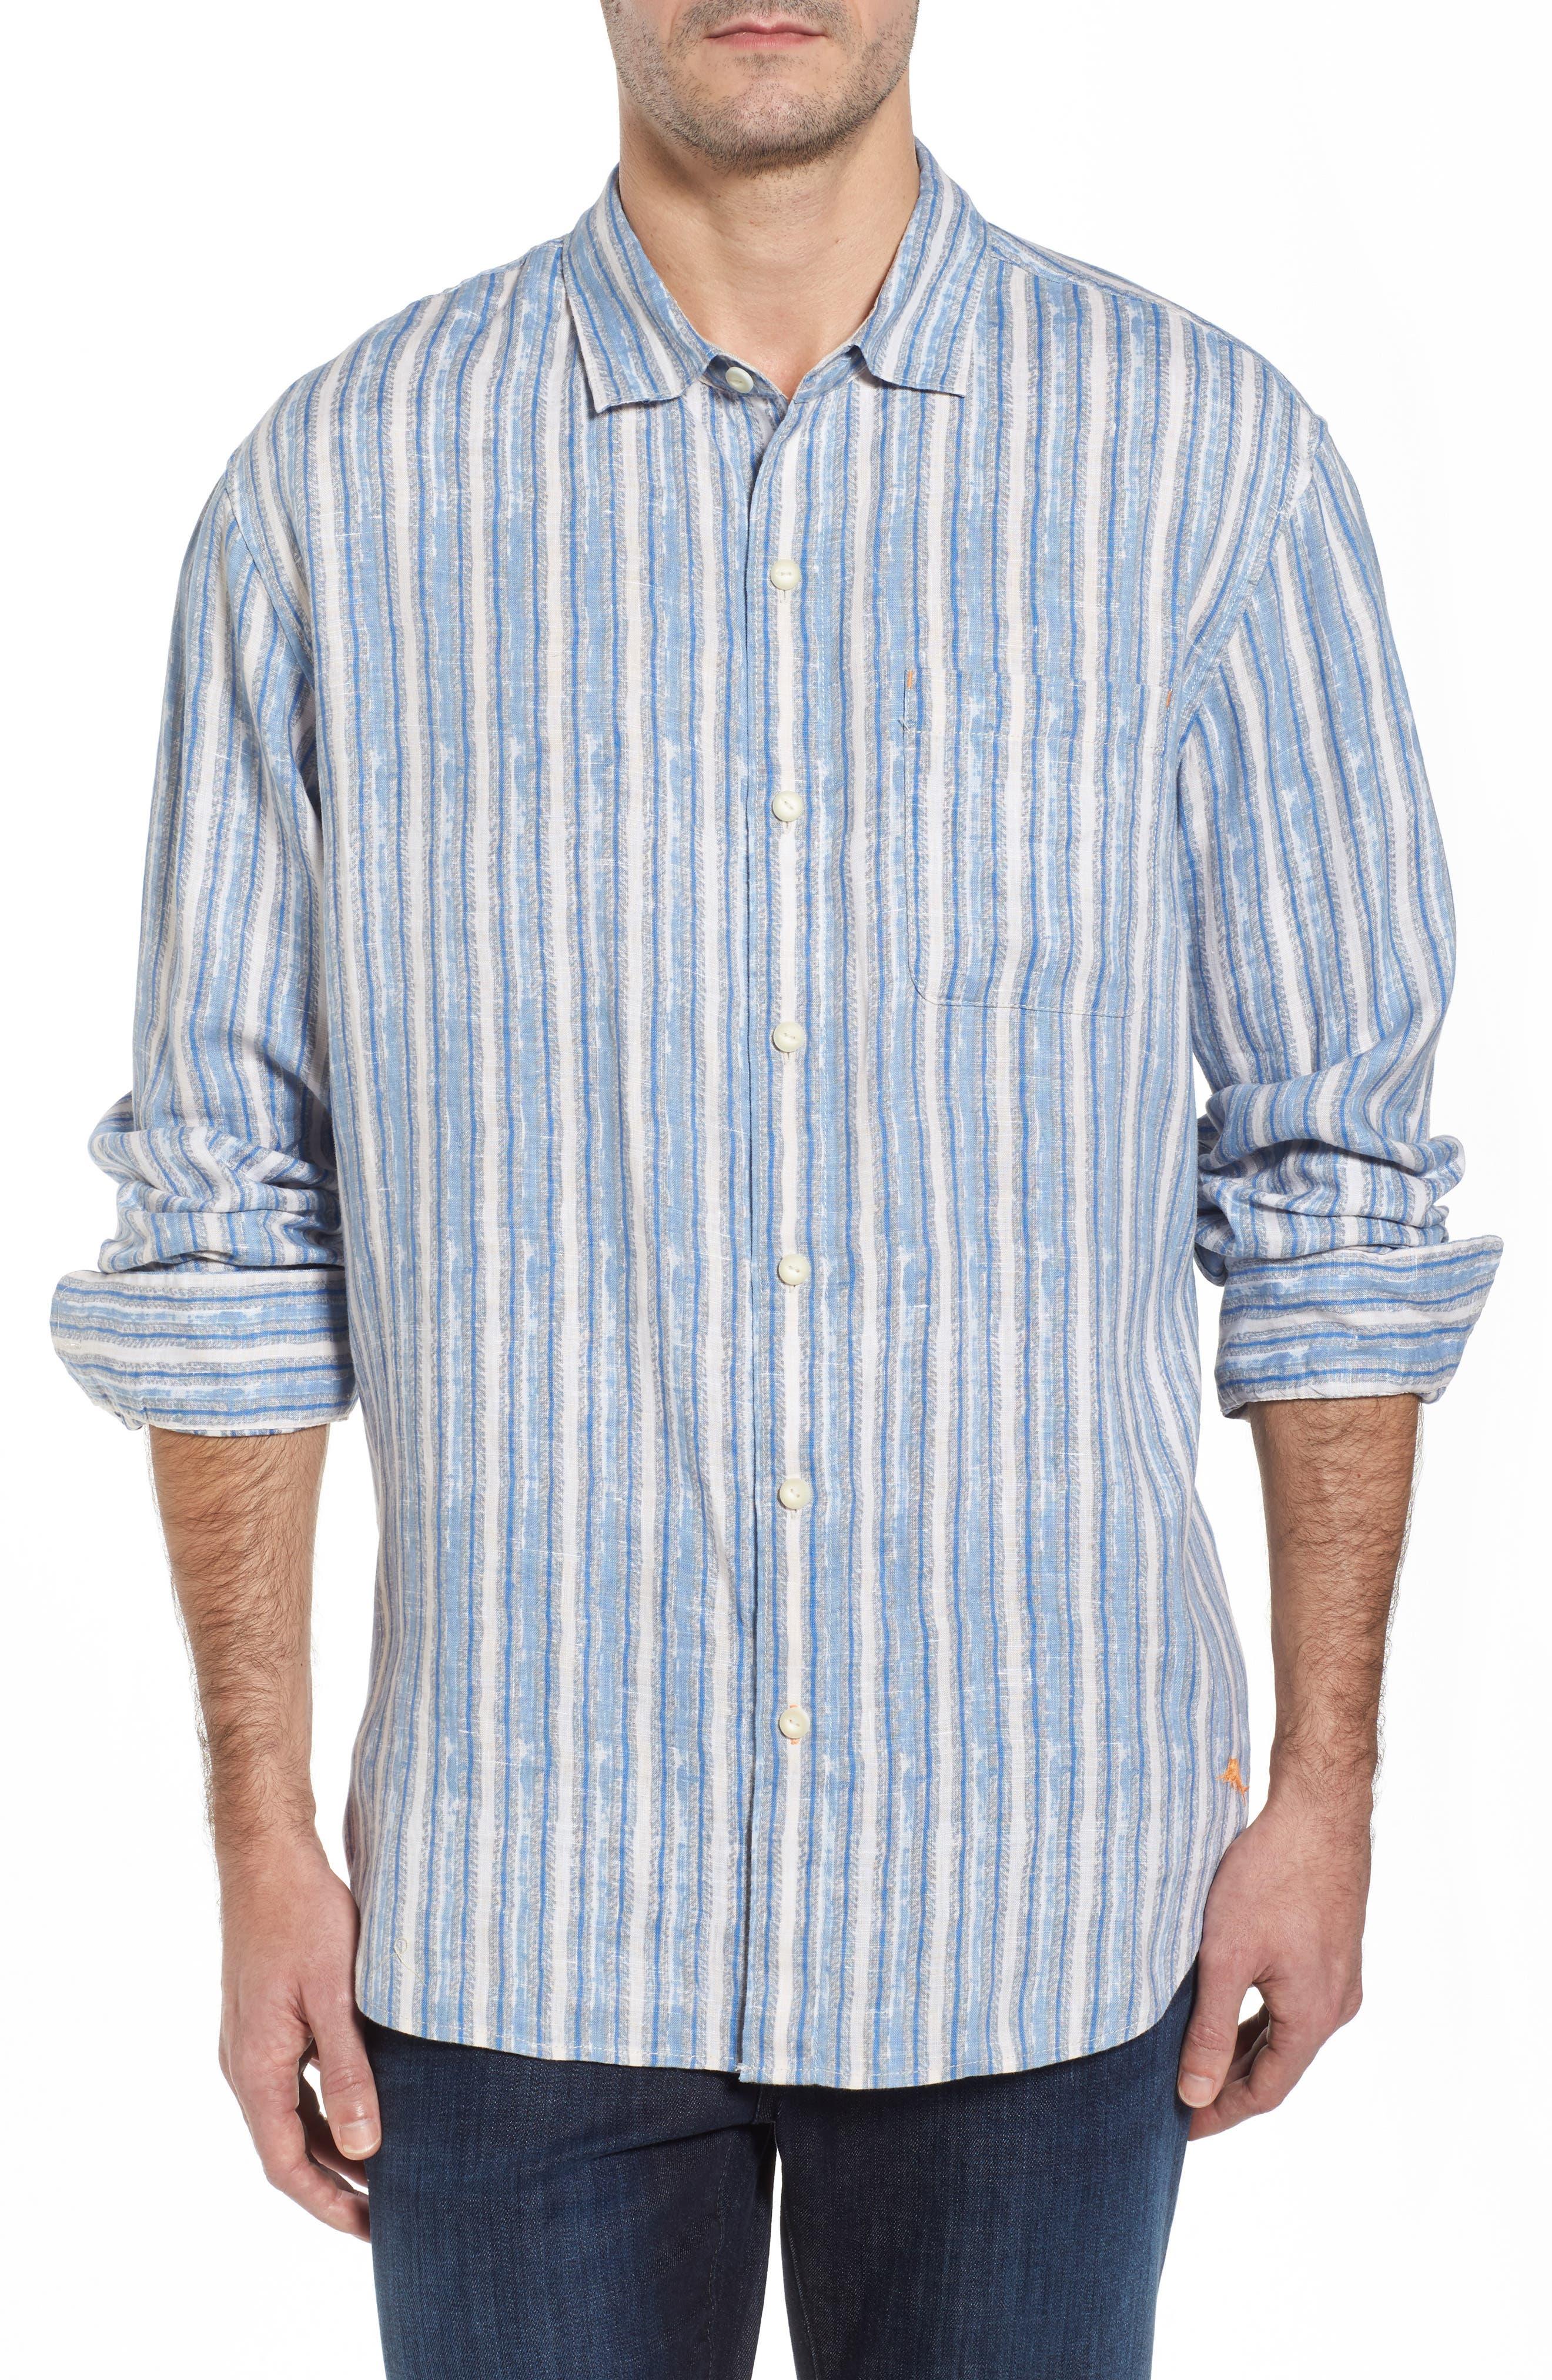 Along Shore Stripe Linen Sport Shirt,                             Main thumbnail 1, color,                             400